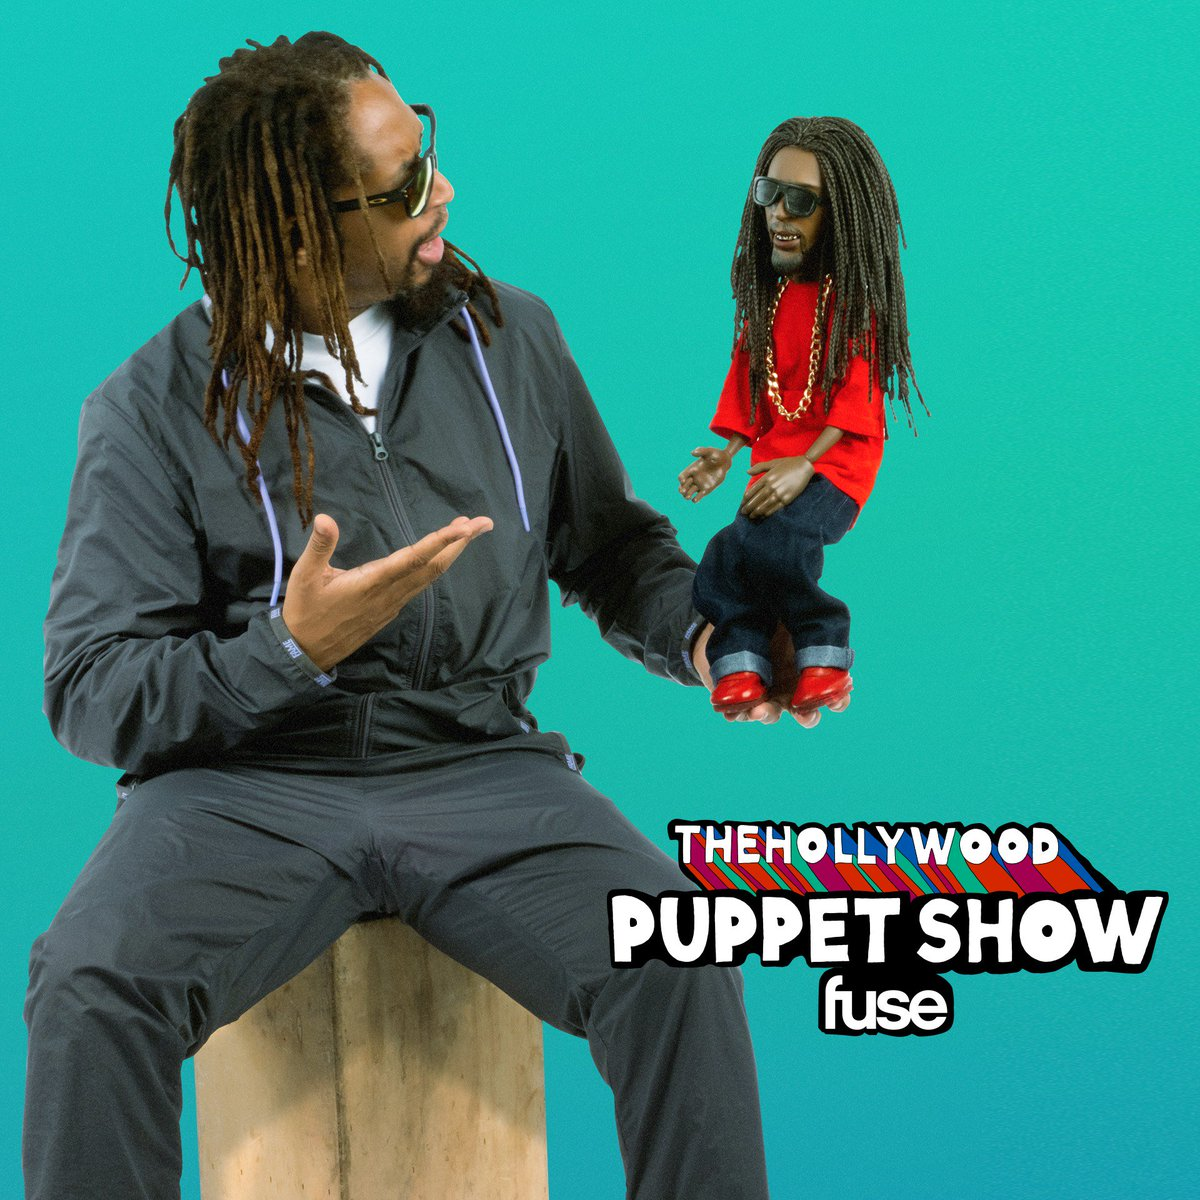 RT @LastWordPR: Don't miss @LILJON on @FUSE's Hollywood #PuppetShow tomorrow night at 10:30pm!! https://t.co/EpT8Ekh7Wa